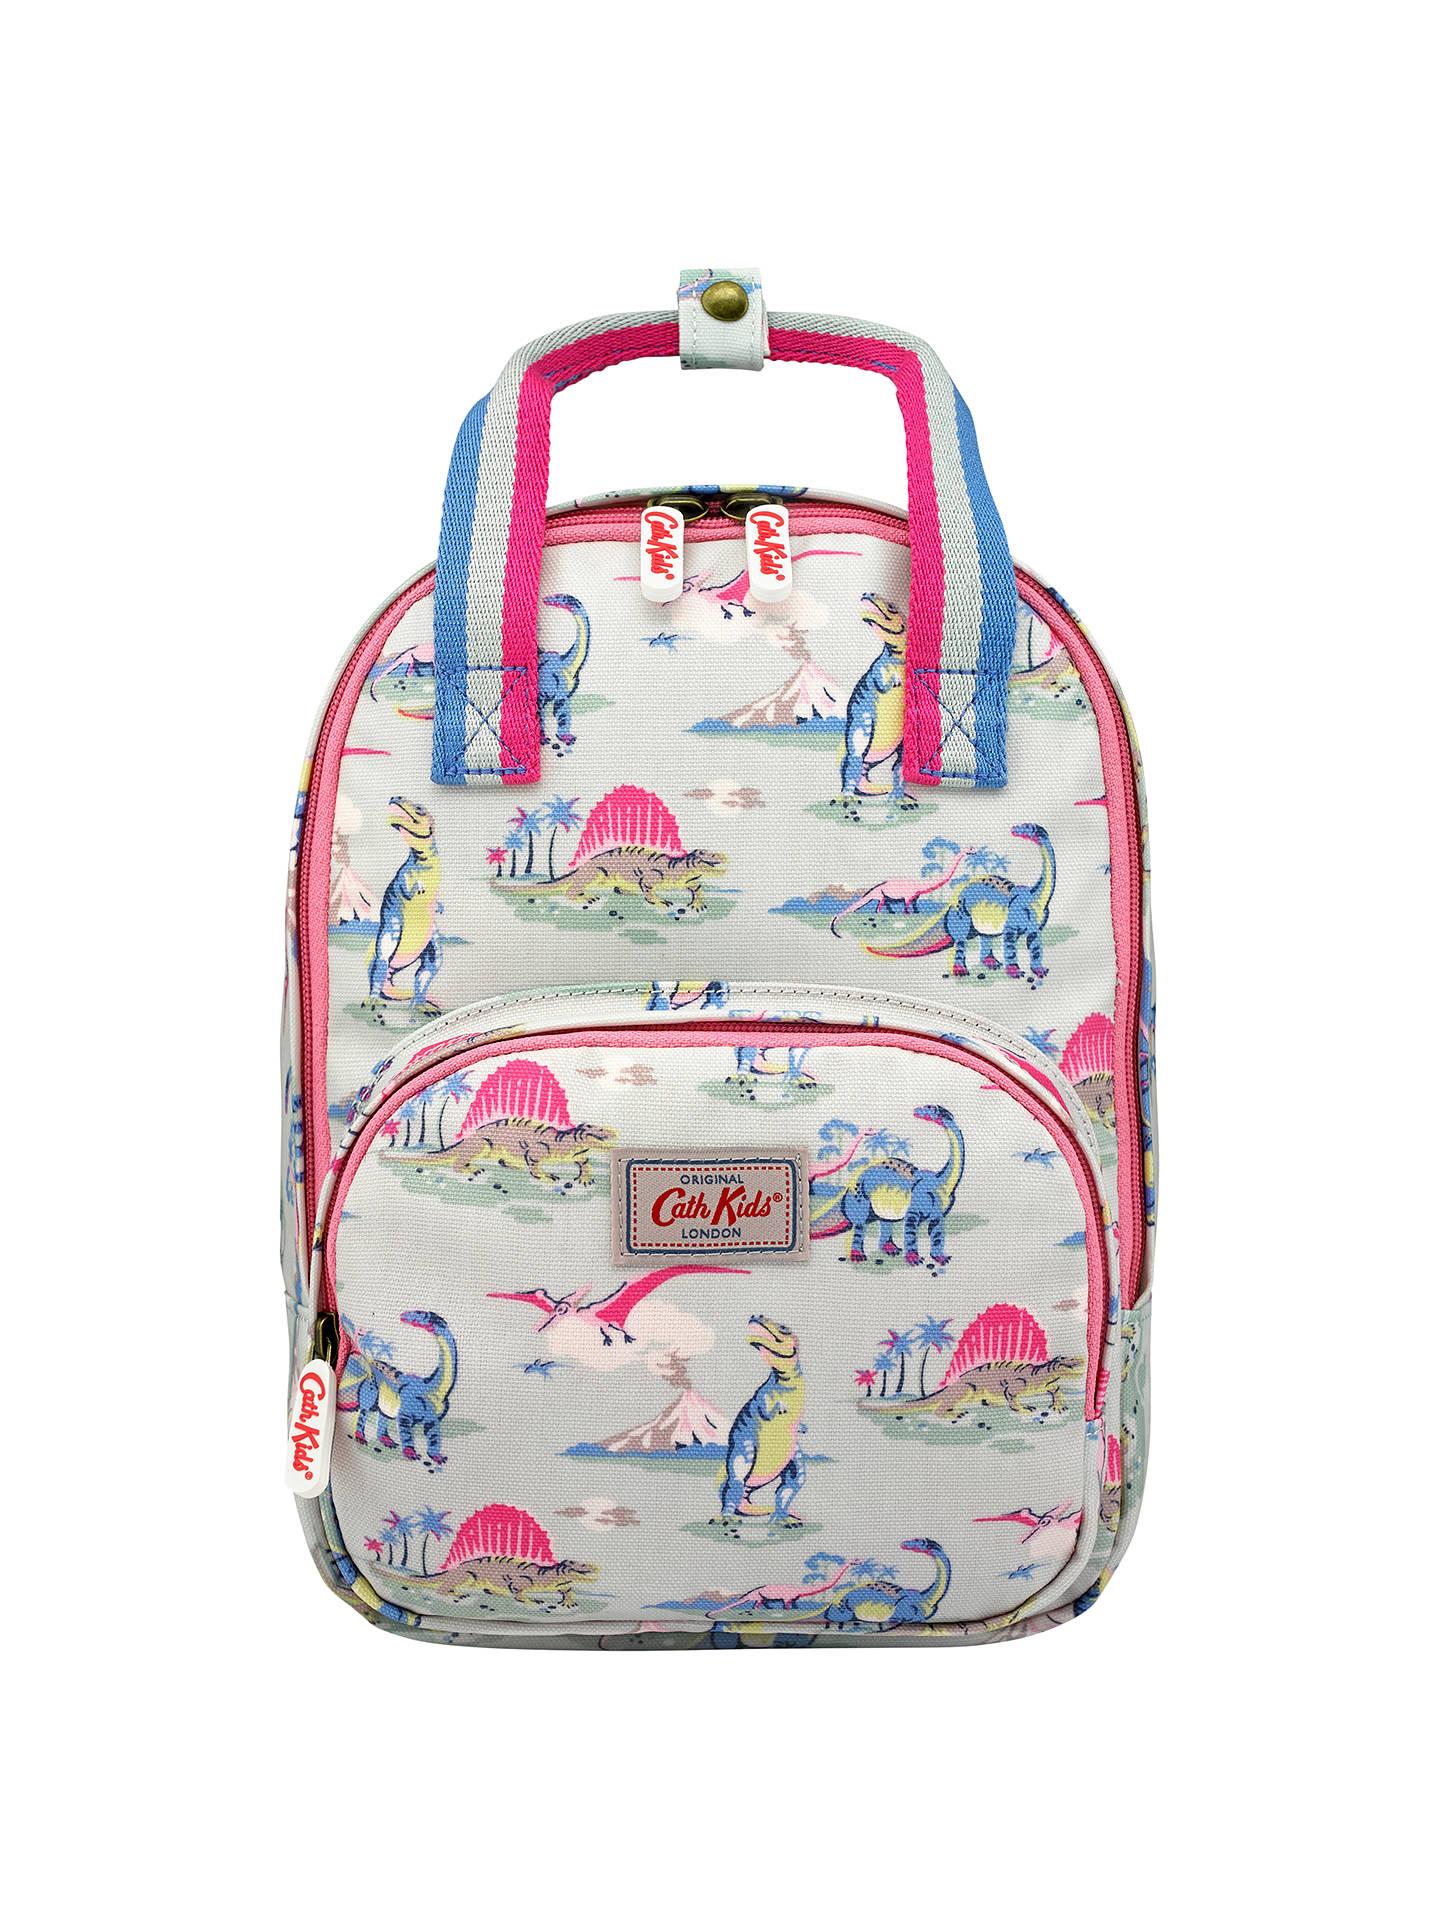 Cath Kidston Children S Dinosaur Print Medium Backpack Blue Pink At